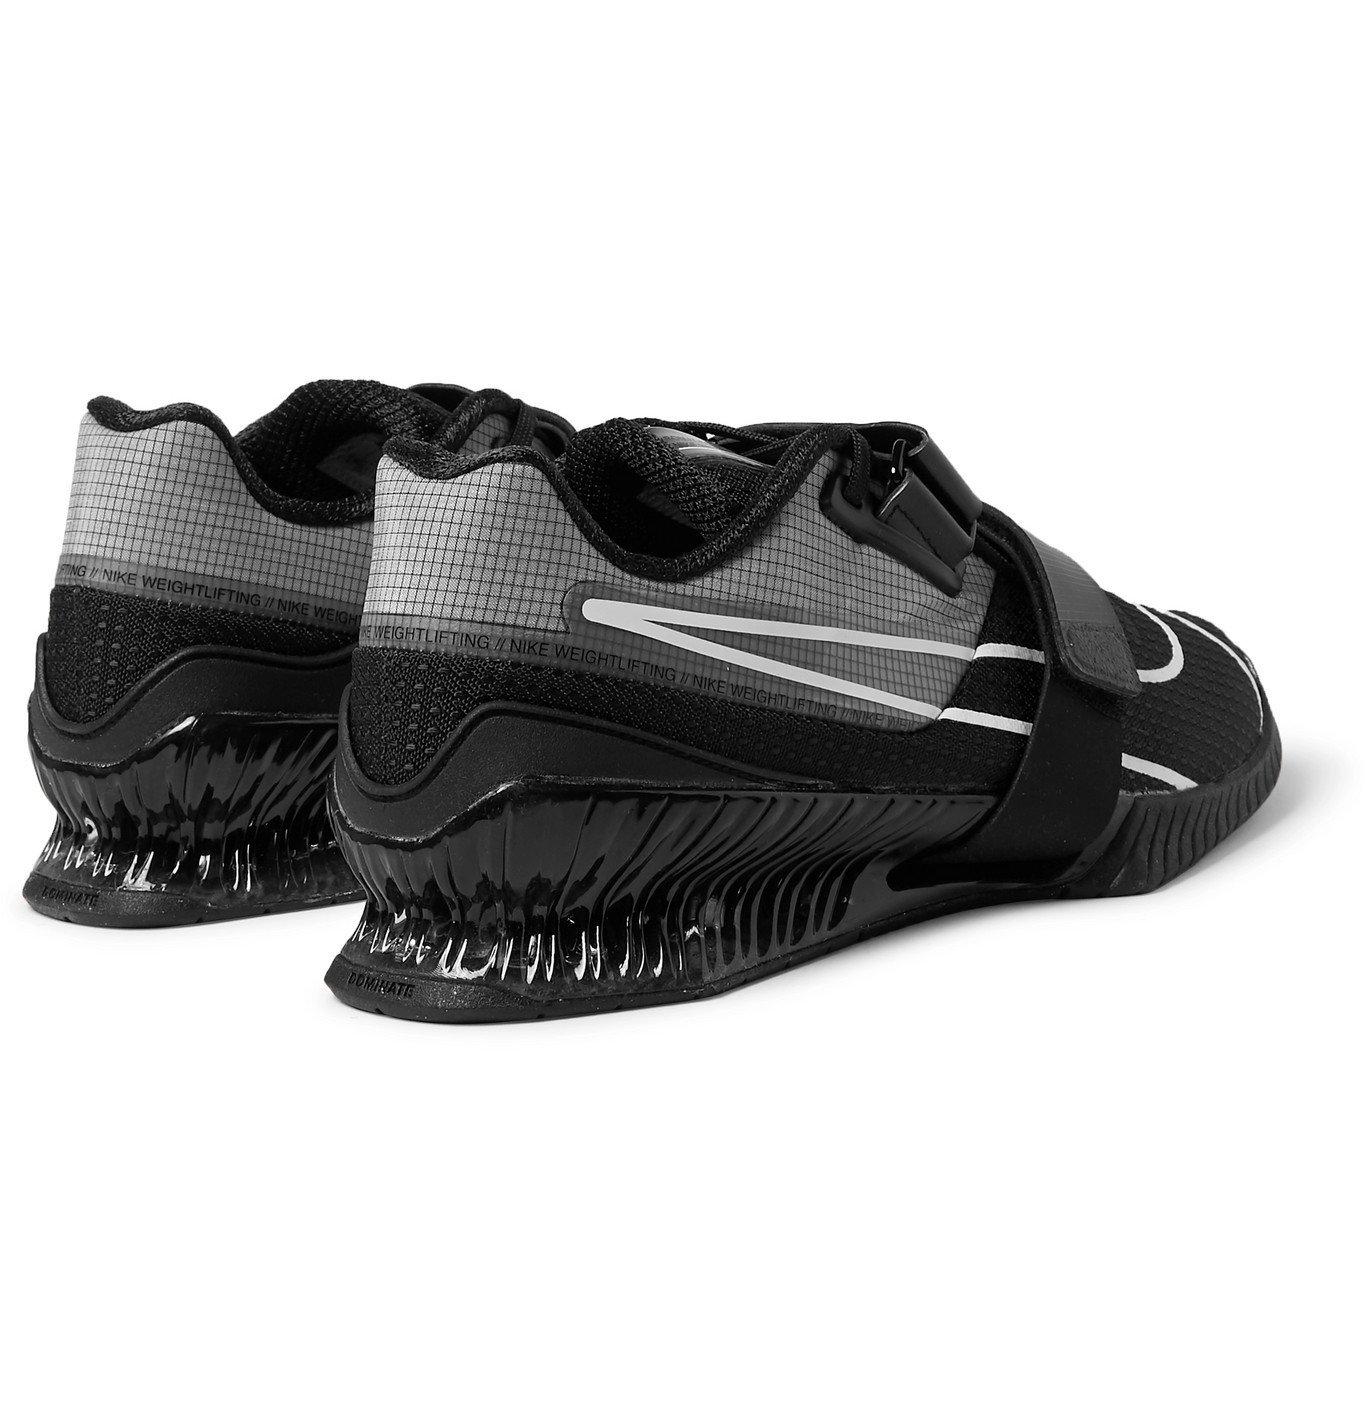 Nike Training - Romaleos 4 Ripstop and Mesh Sneakers - Black